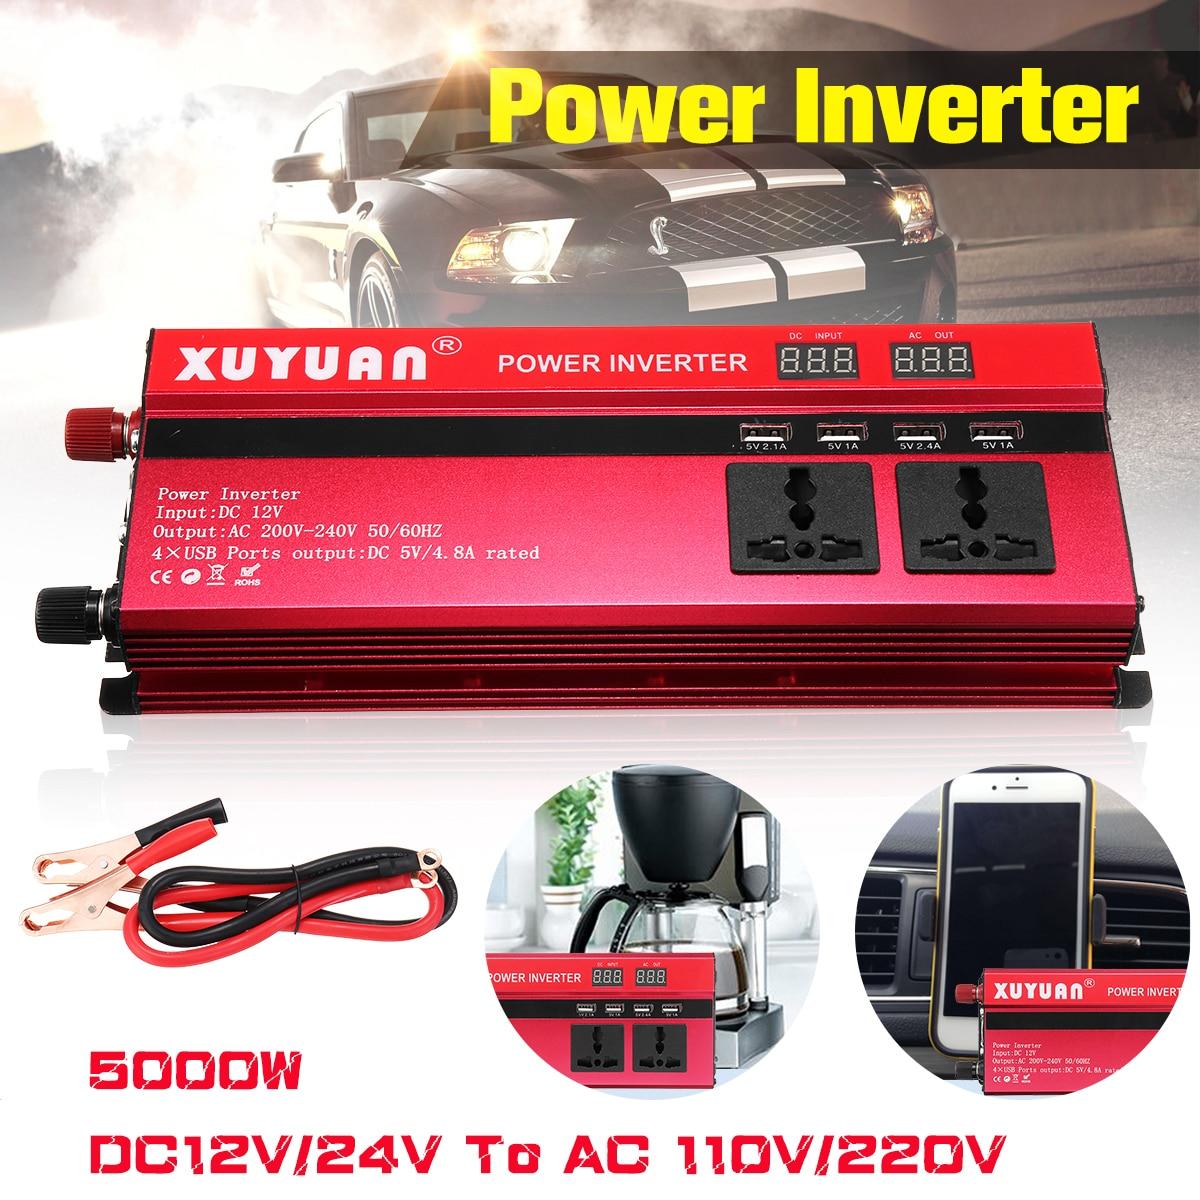 Car Power Inverter 12V 220V 5000W 4000W 3000W Peak Sine Wave Solar Inverter 12V 220V Voltage Converter 5000W Transformer